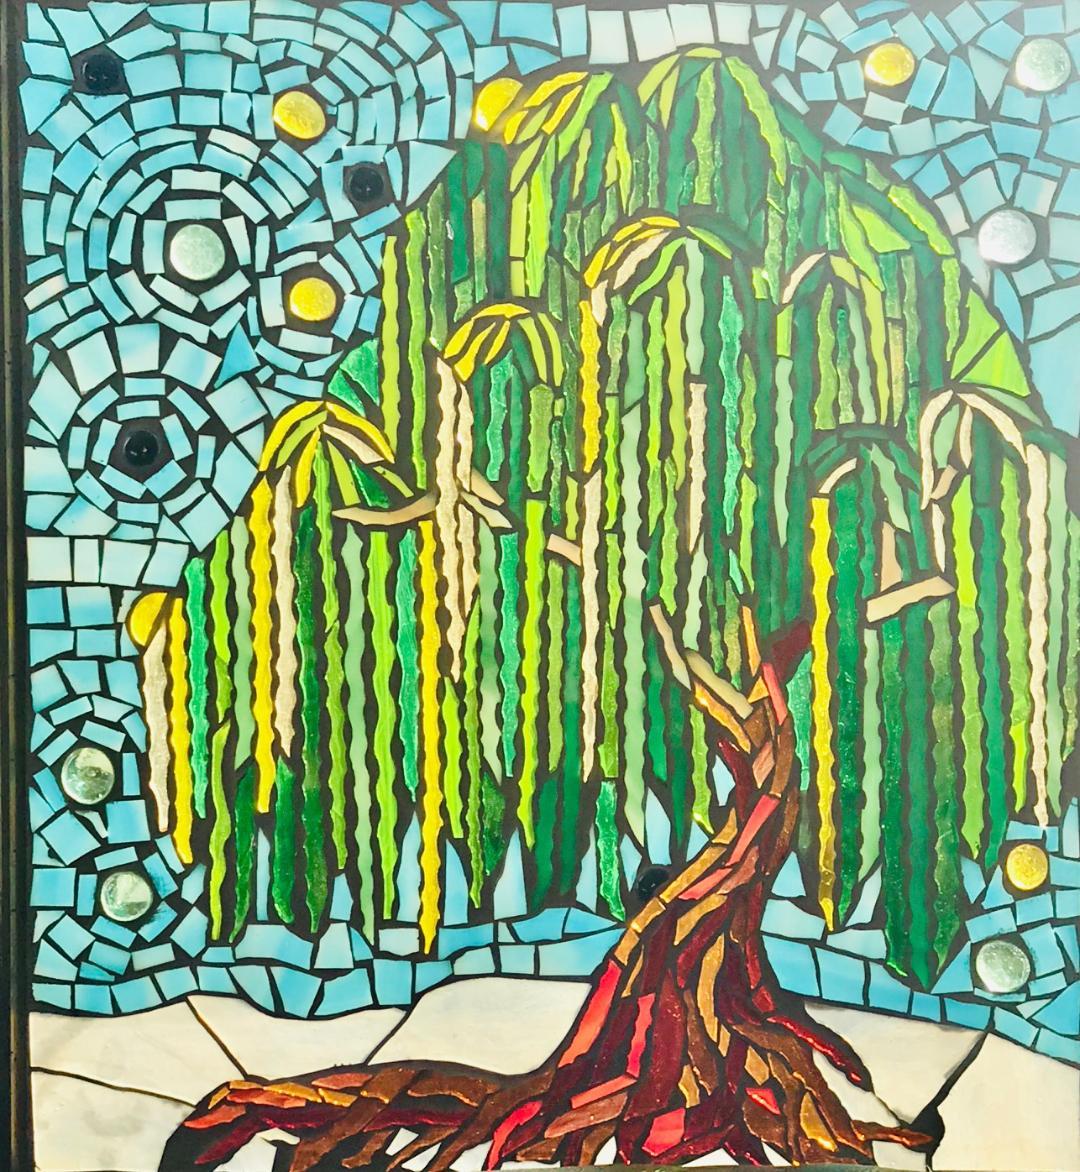 willowtreeglassartpic.jpg